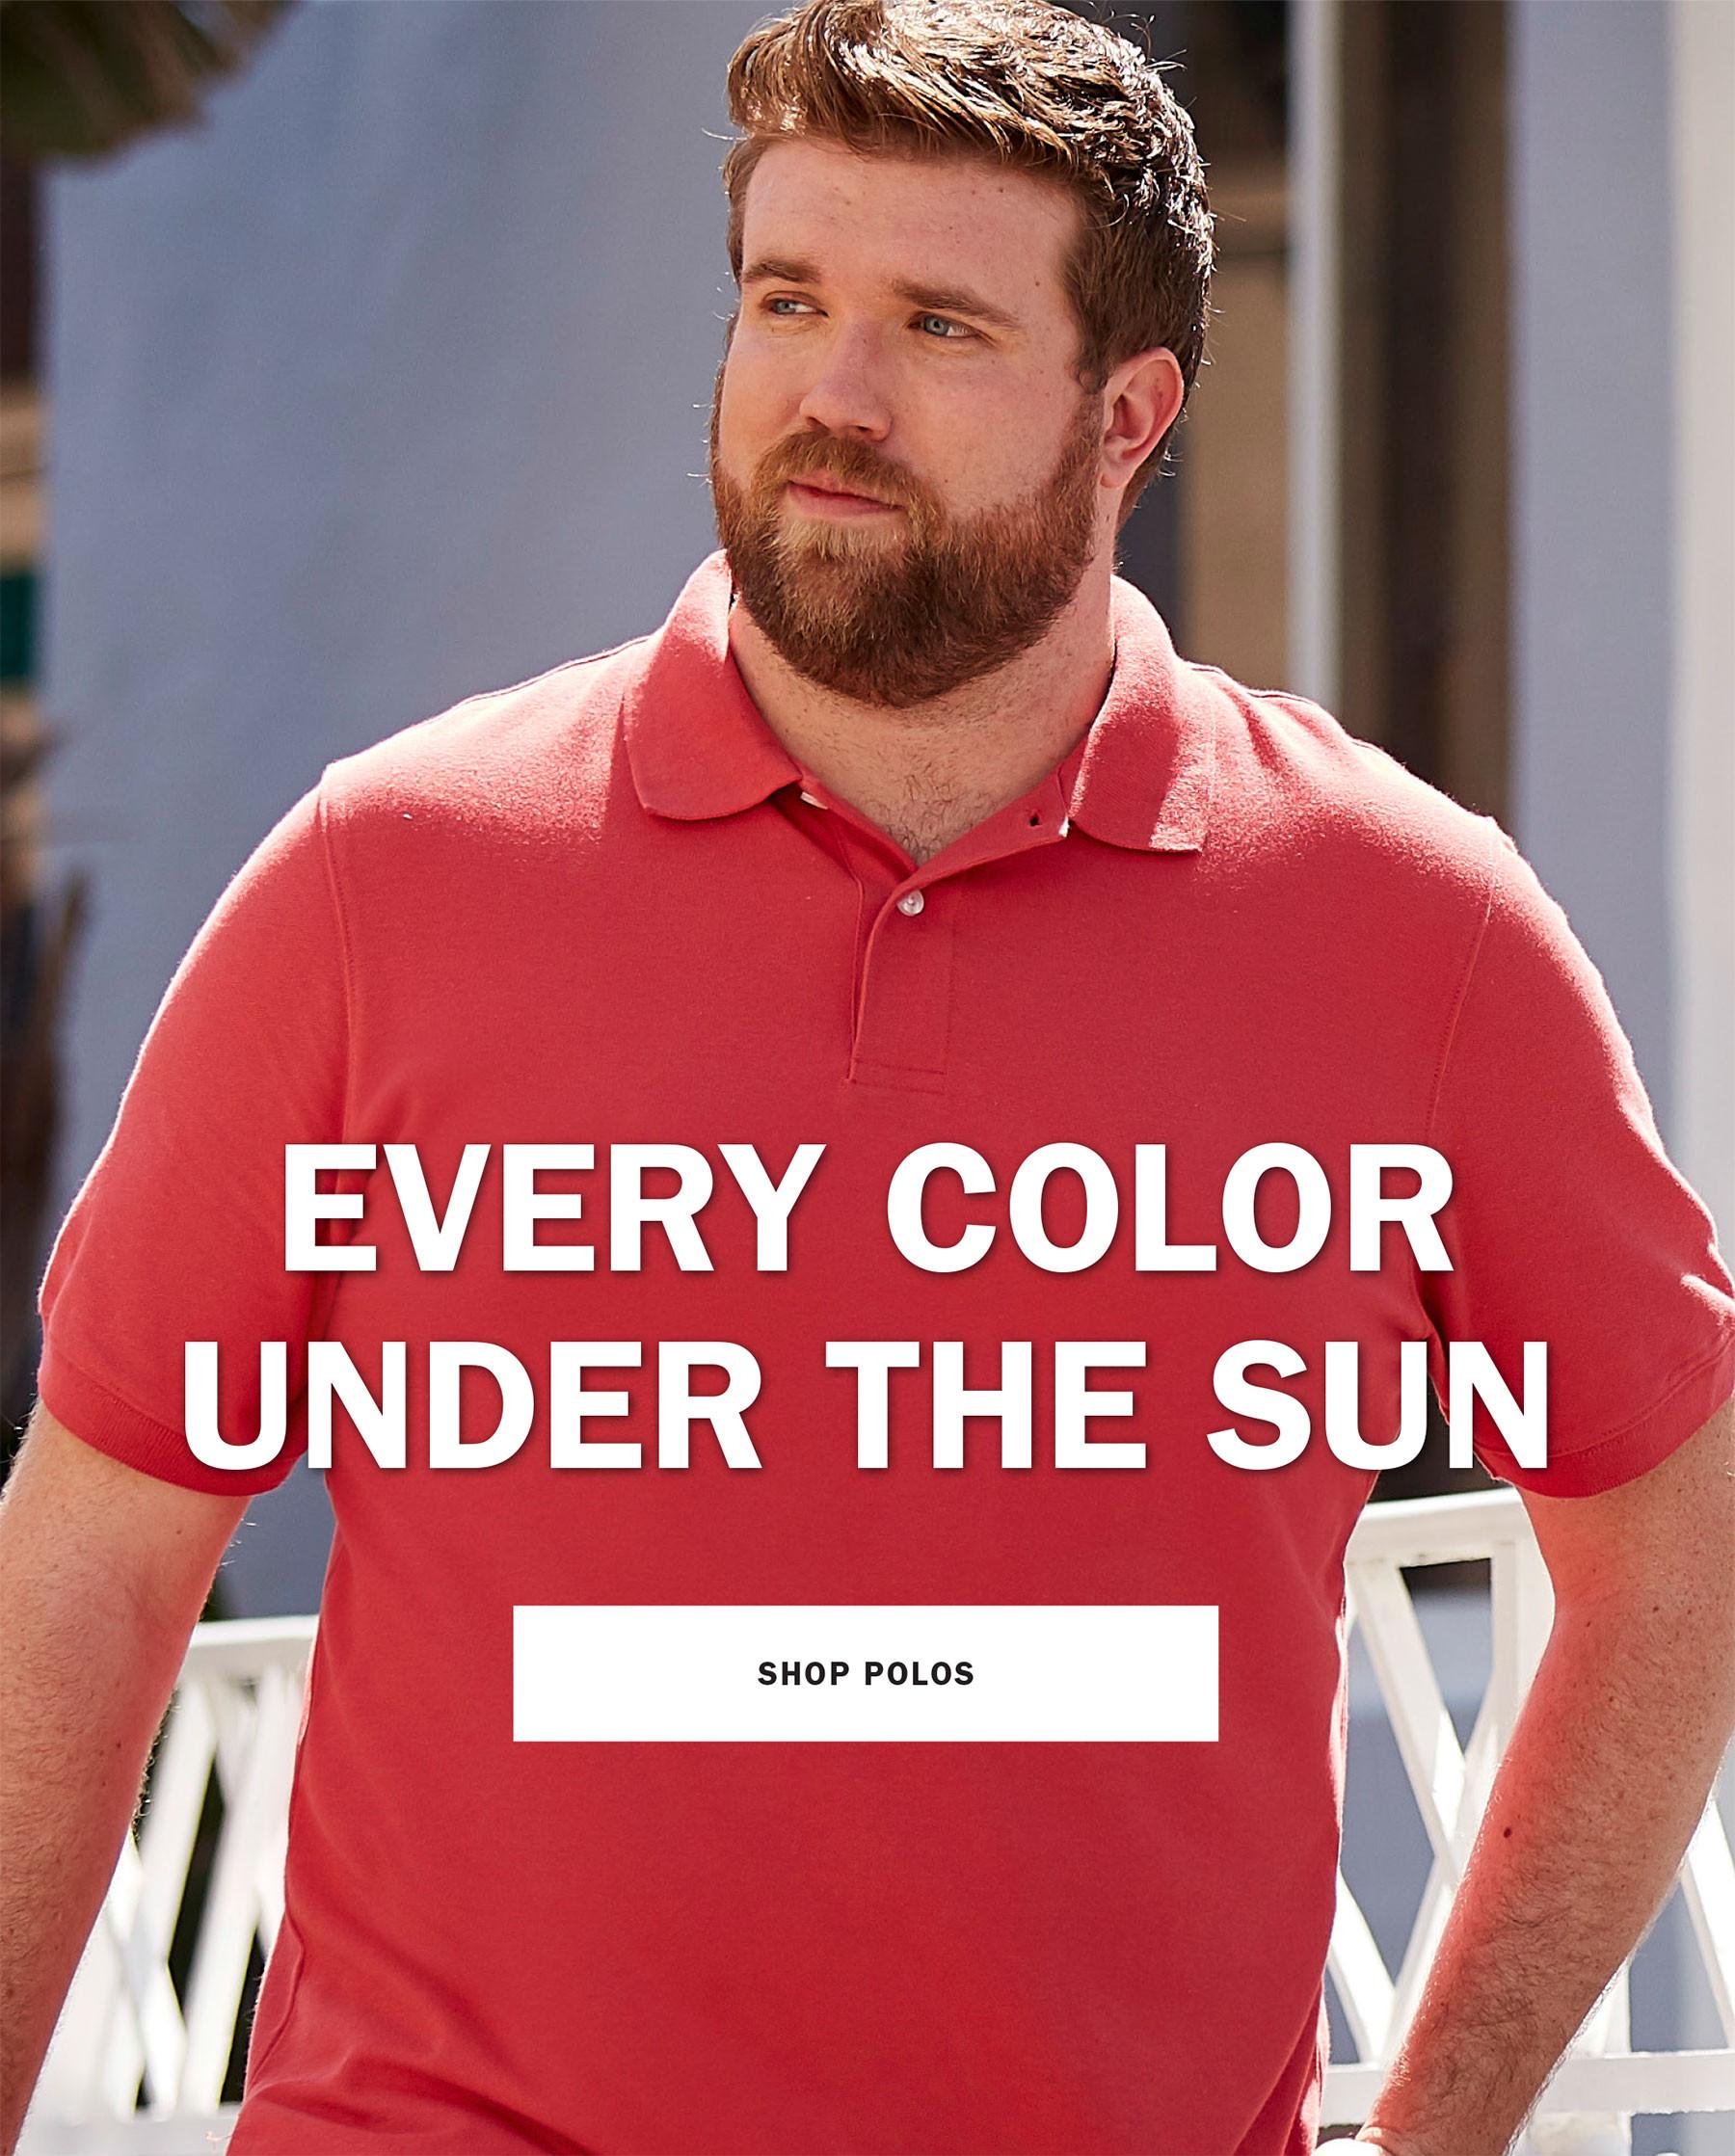 EVERY COLOR UNDER THE SUN | SHOP POLOS